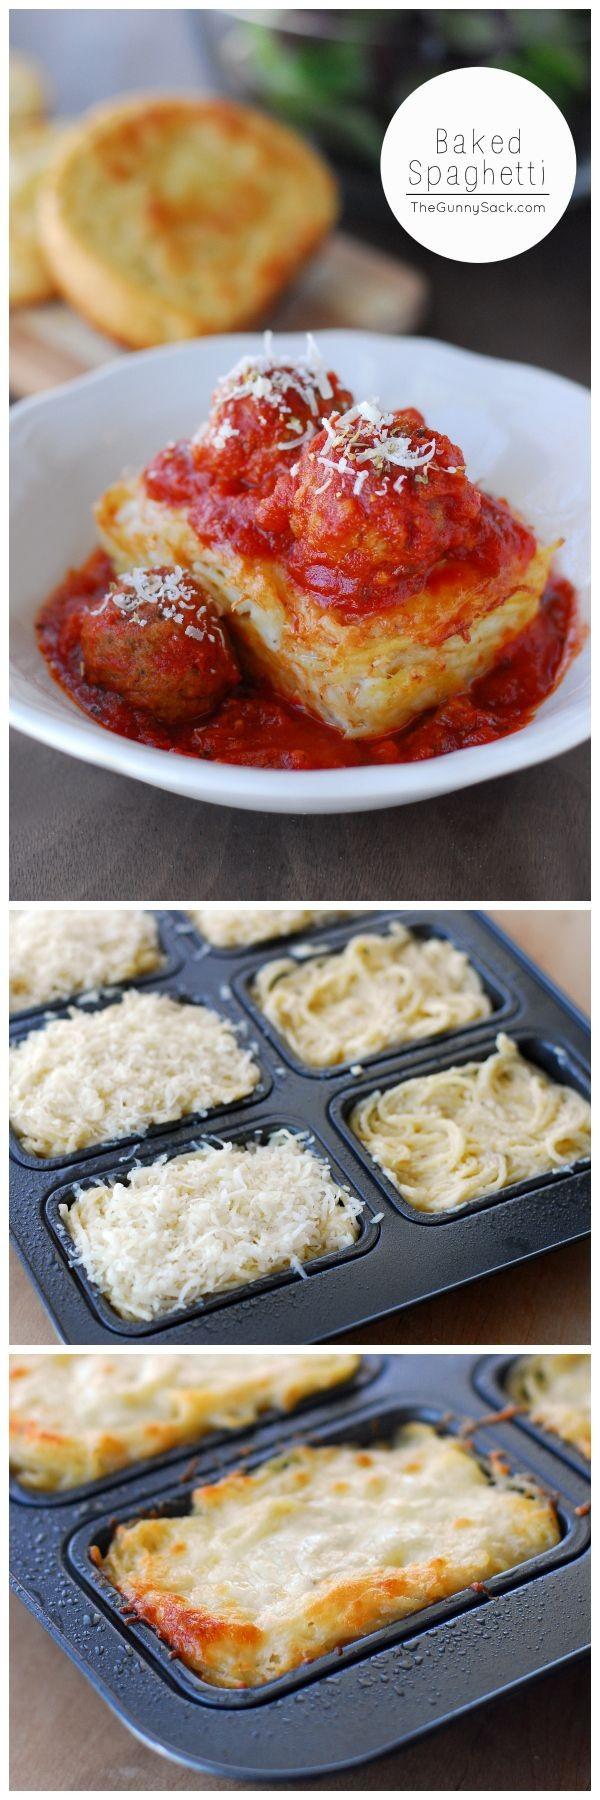 Get the recipe Baked Spaghetti @recipes_to_go